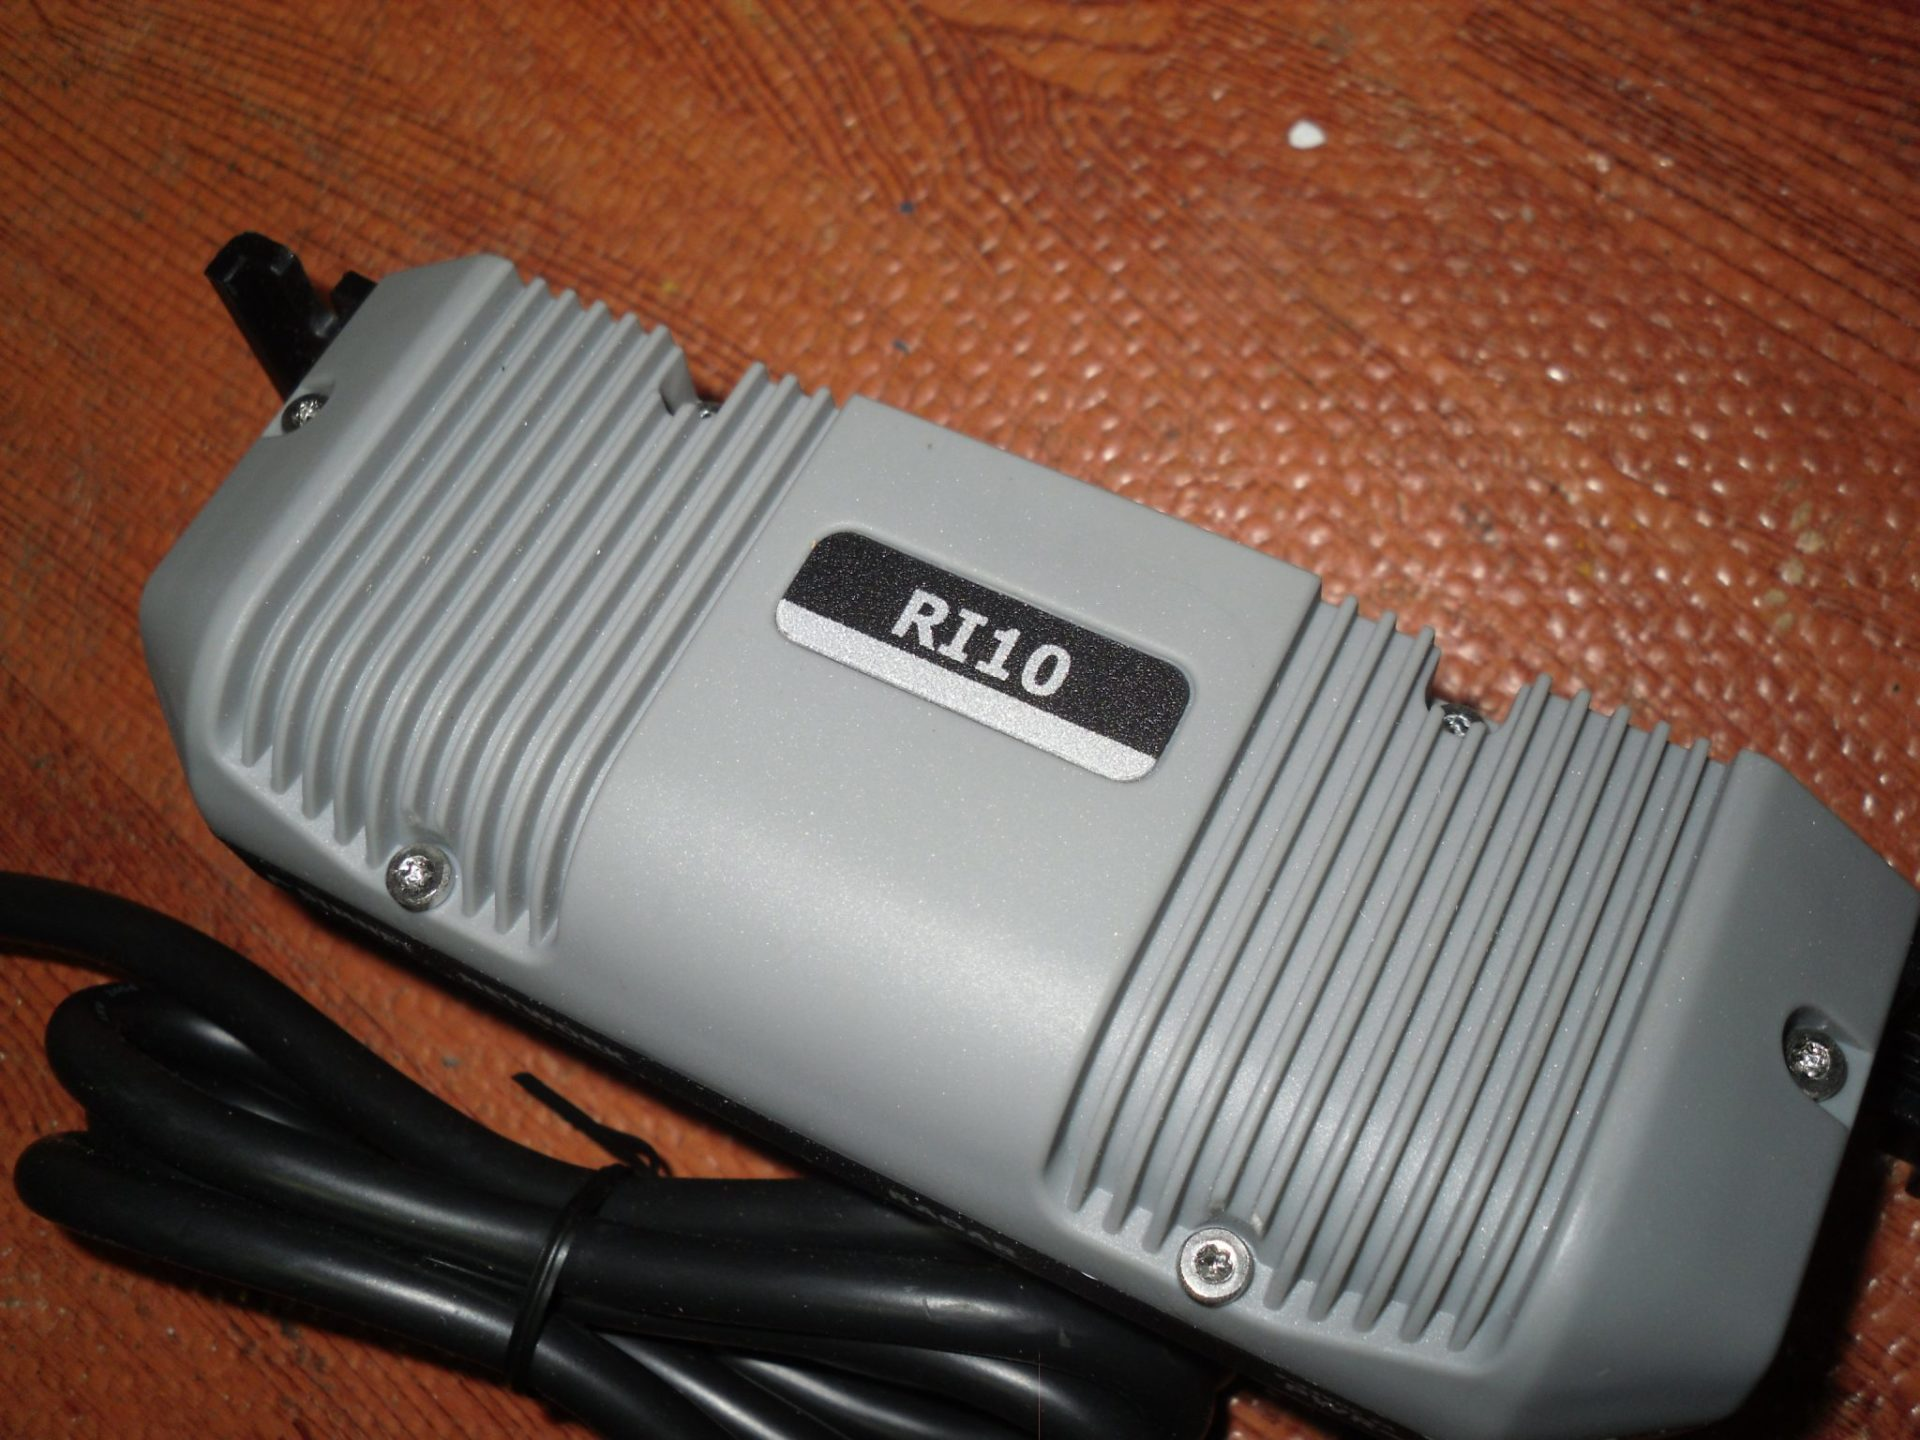 Simrad Lowrance Navico Ri10 Radar Interface Module New In Box Max Wiring To Vhf Radio